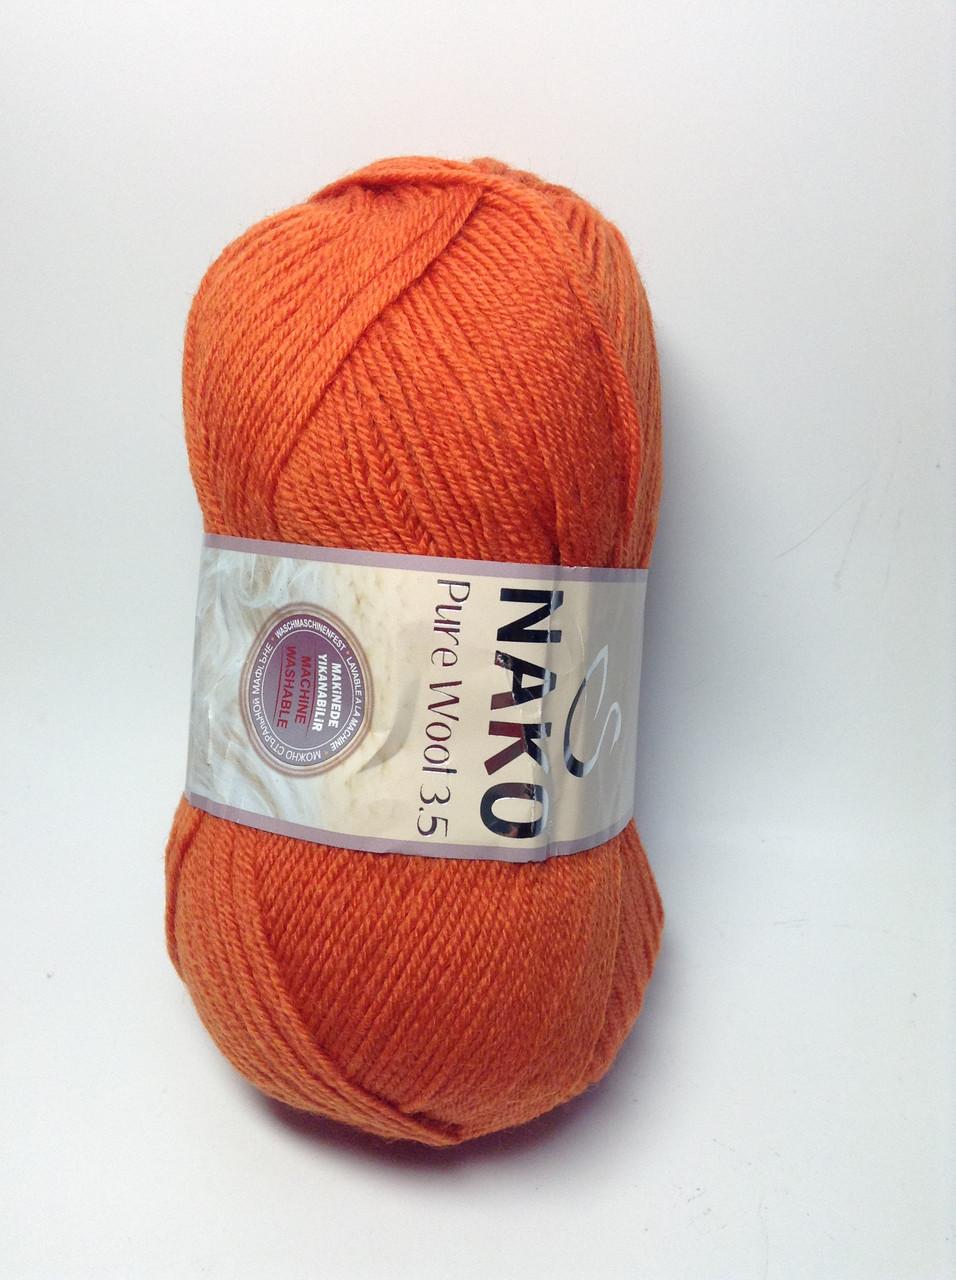 Пряжа nako pure wool 3.5 - цвет светло-рыжий